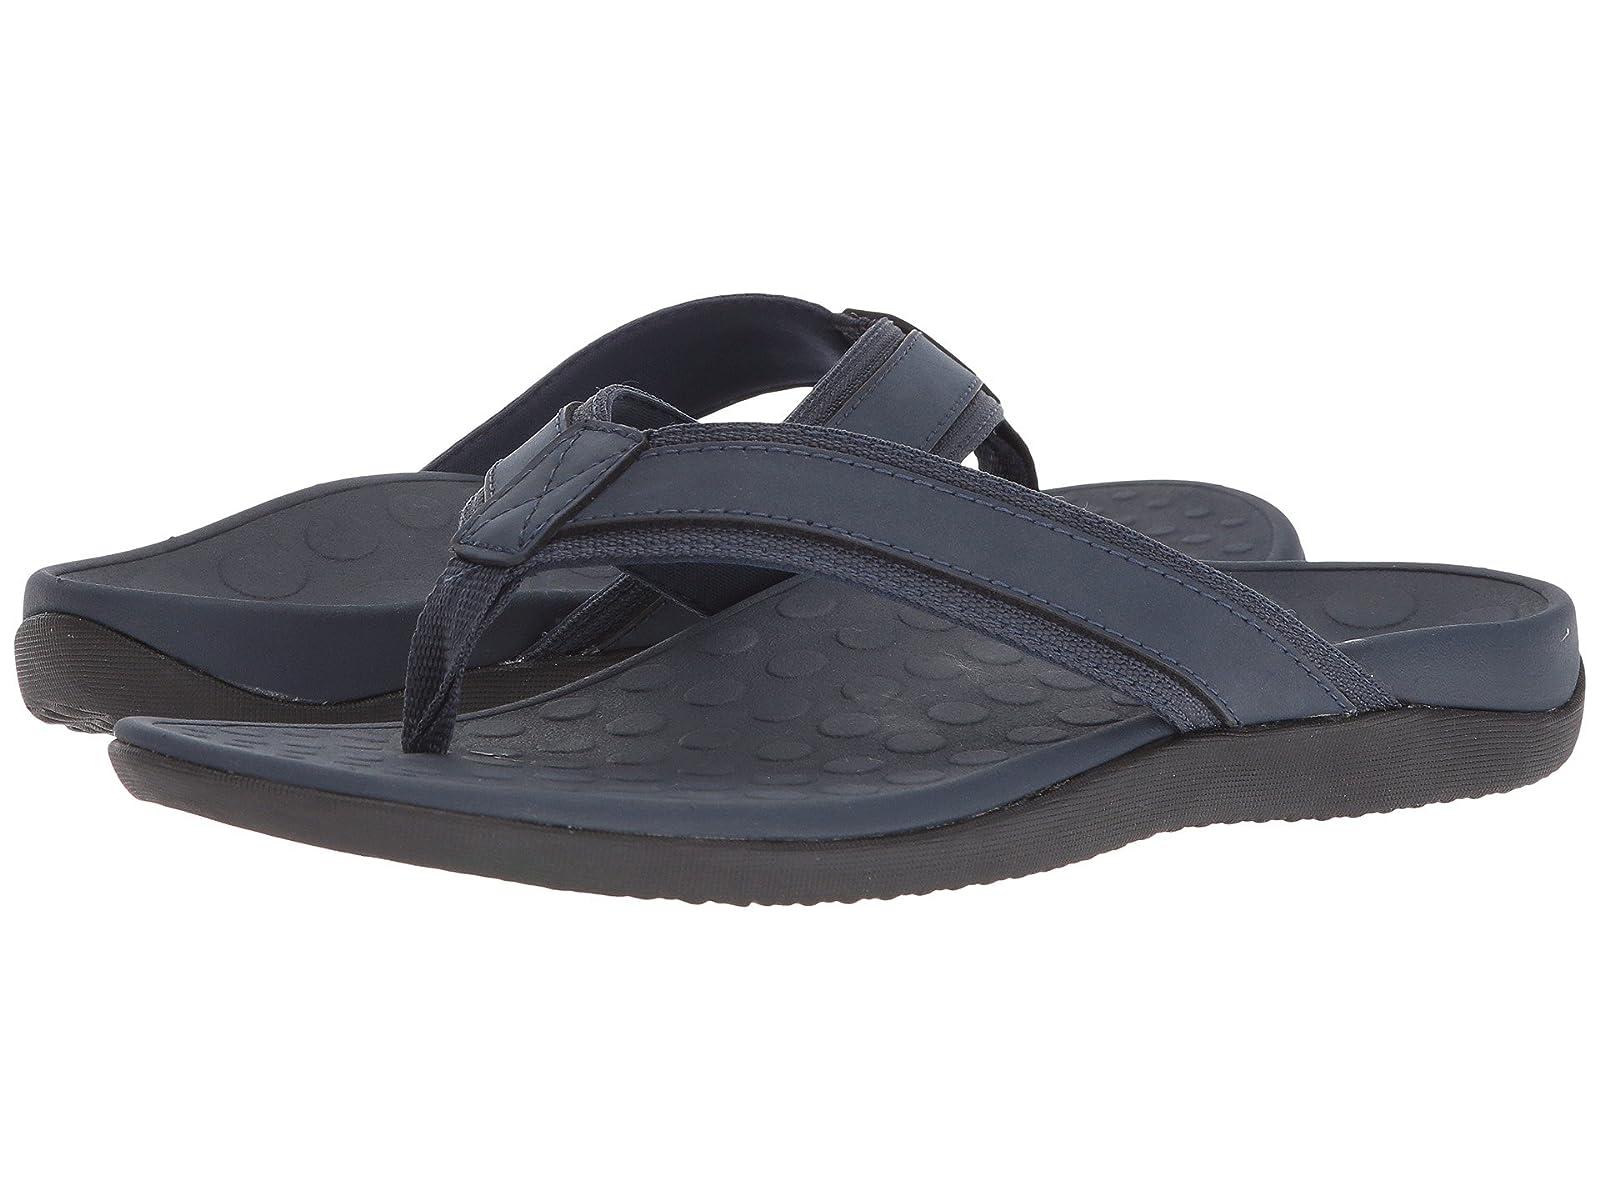 VIONIC Men's TideAtmospheric grades have affordable shoes